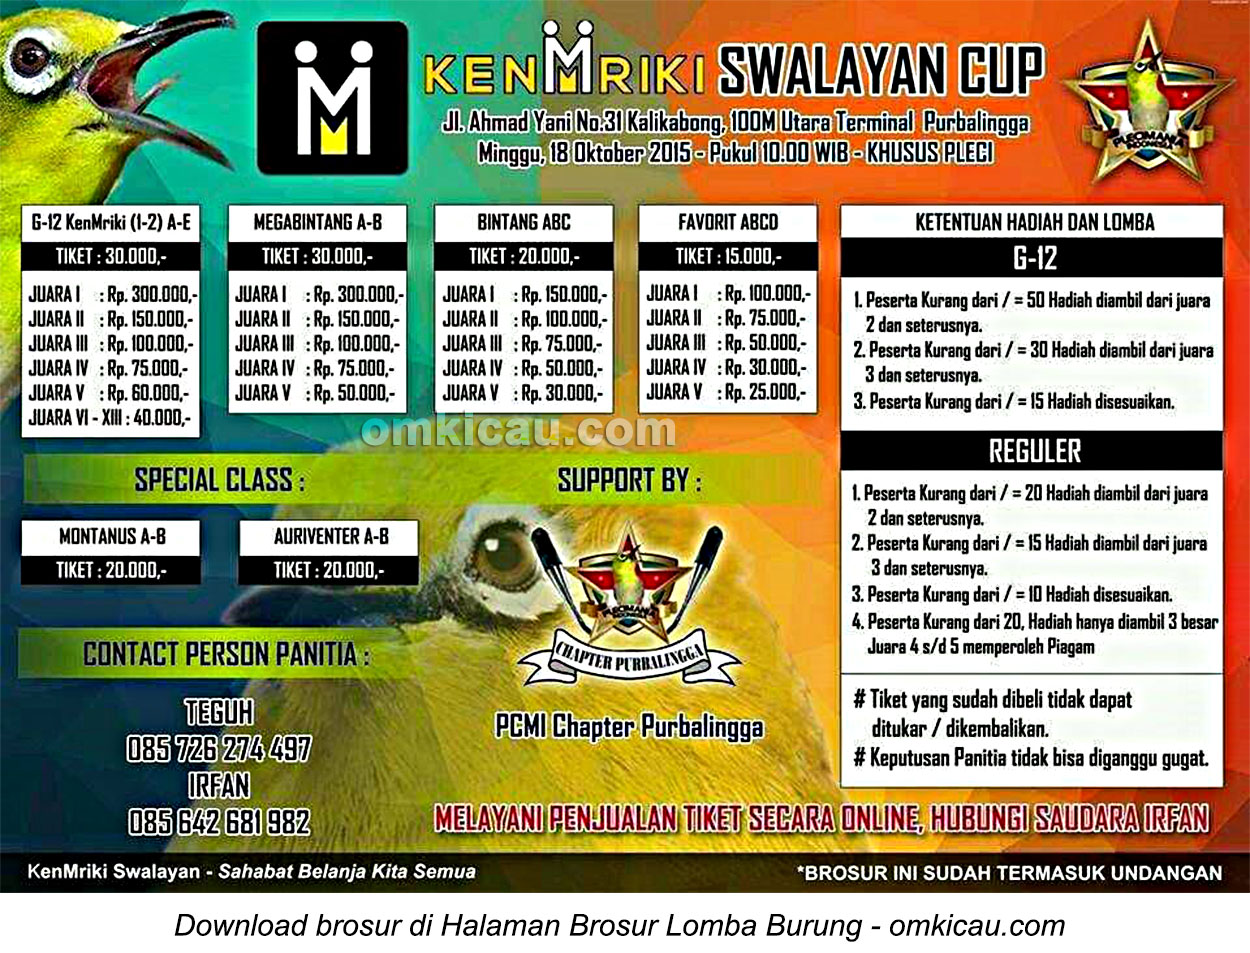 Brosur Lomba Burung Khusus Pleci KenMriki Swalayan Cup, Purbalingga, 18 Oktober 2015